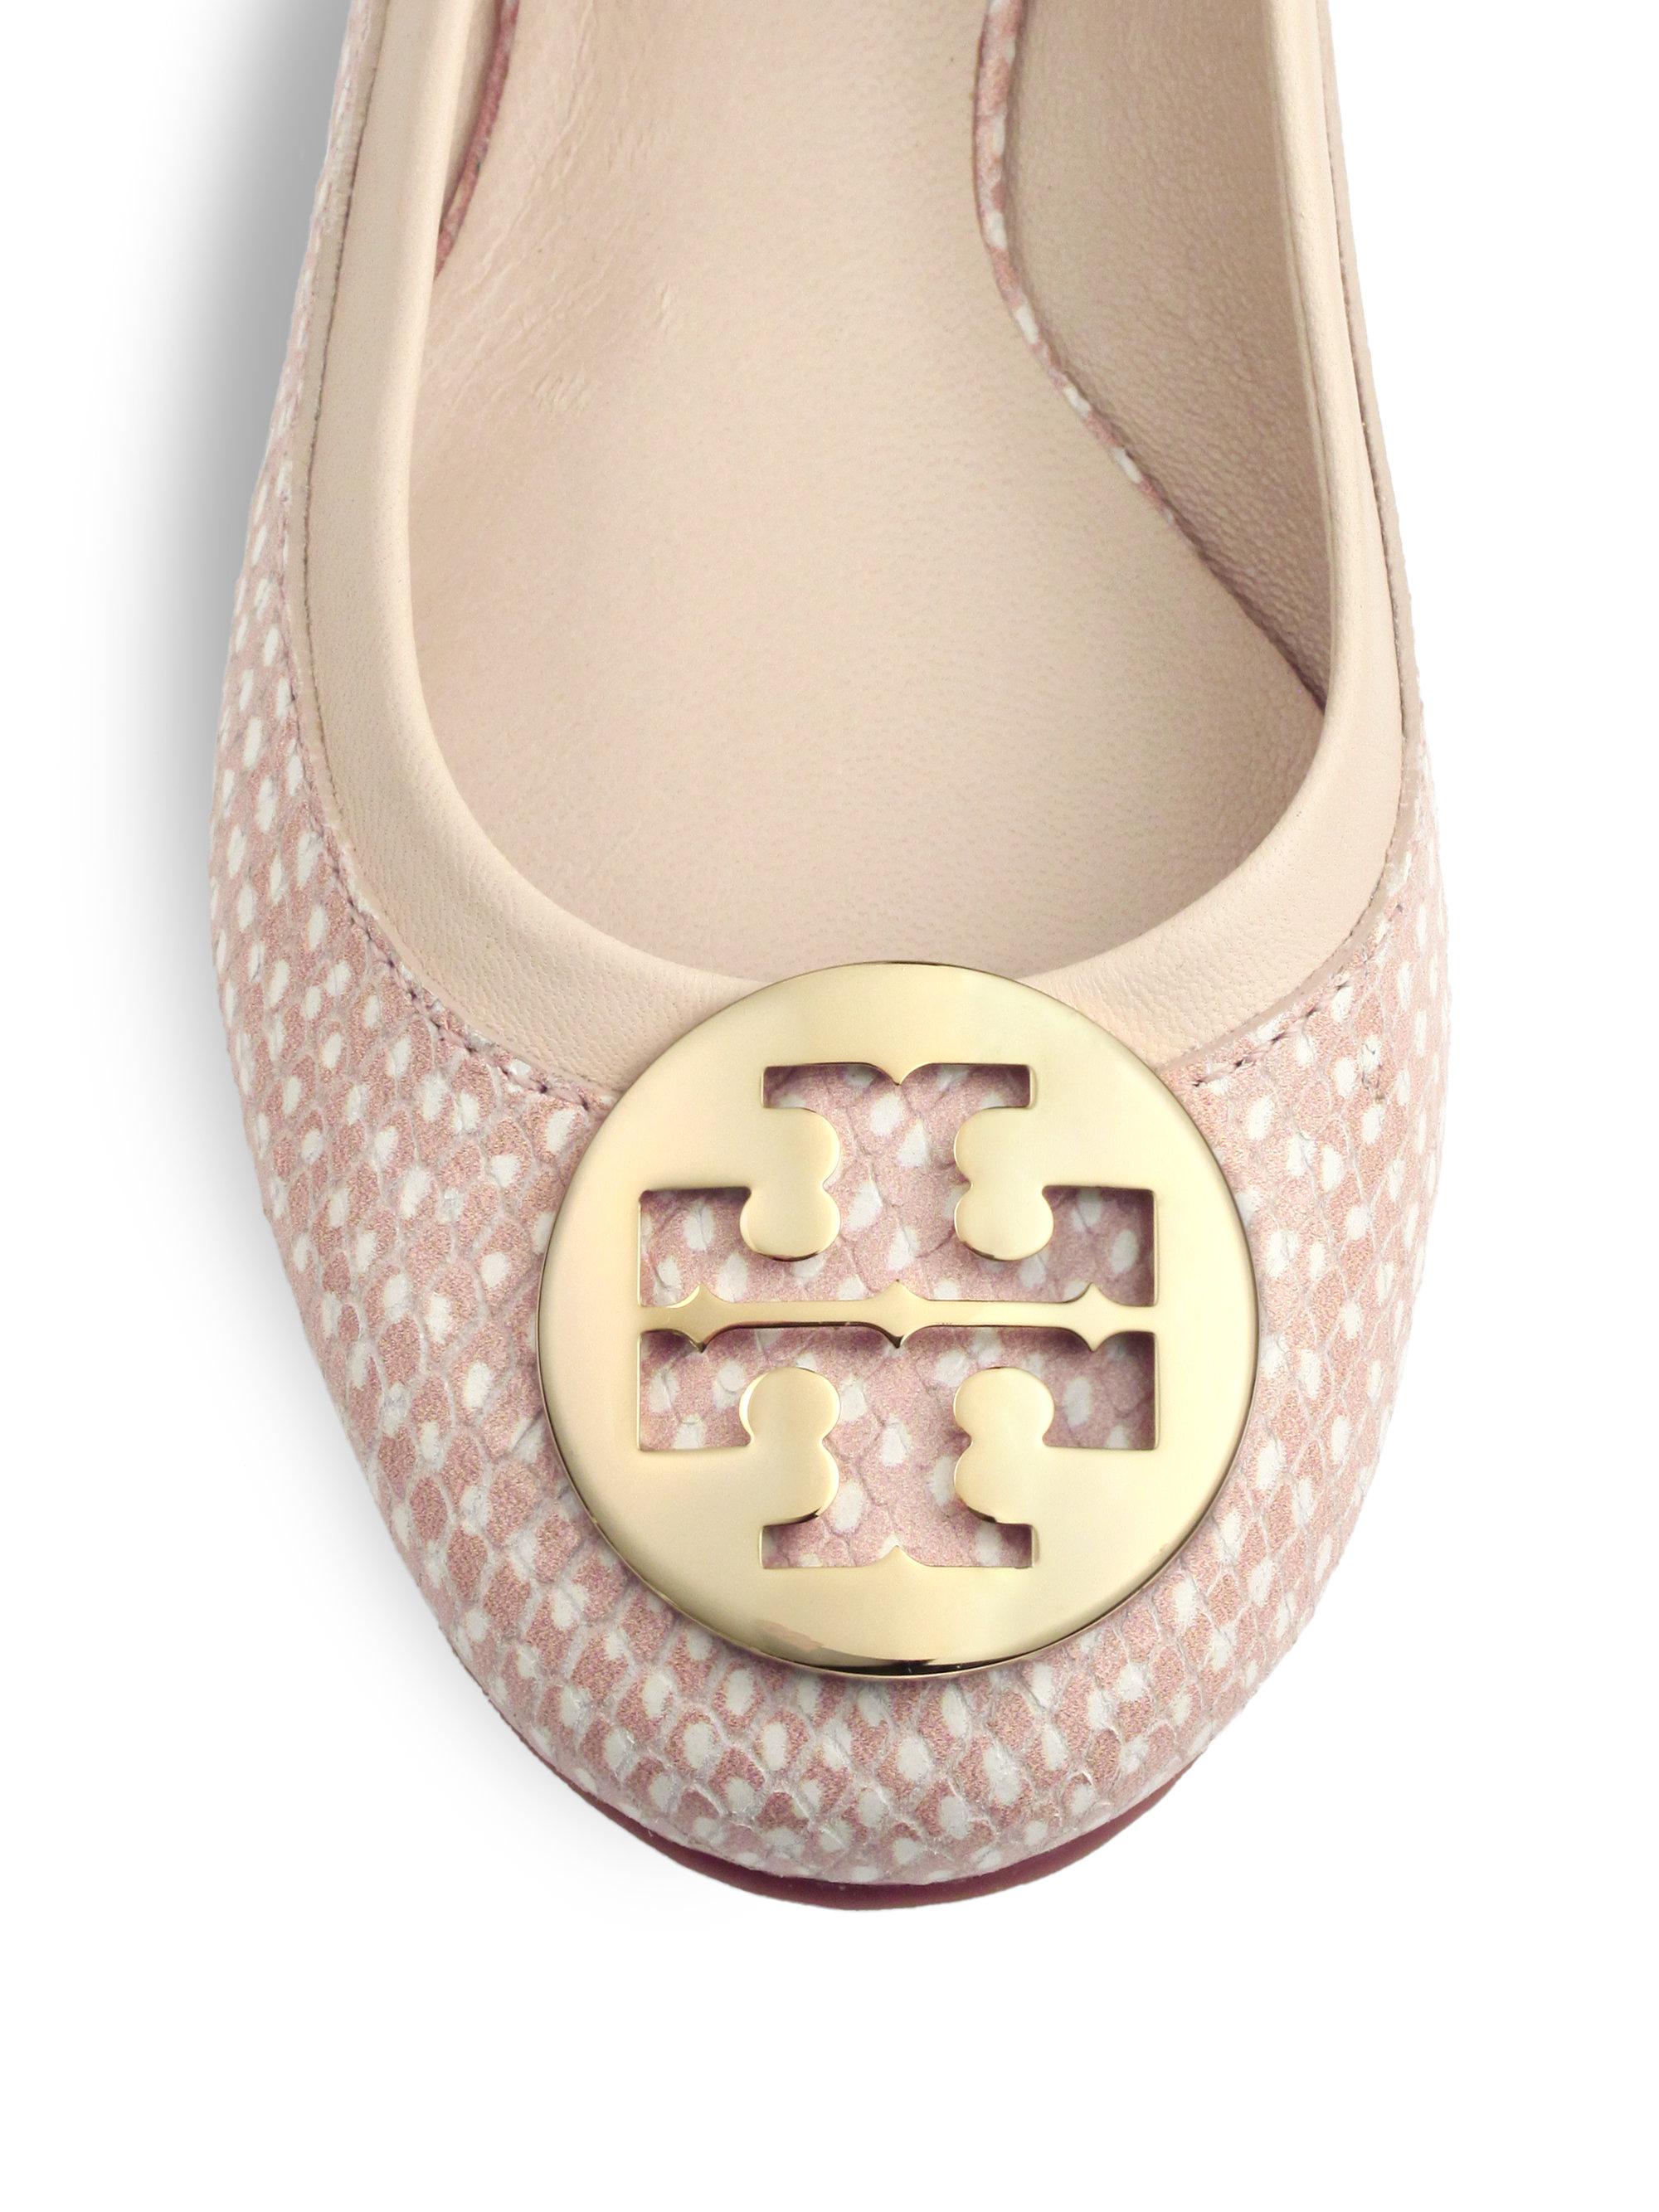 60ab1a9b9 Lyst - Tory Burch Reva Polka Dot Snakeskin Ballet Flats in Pink